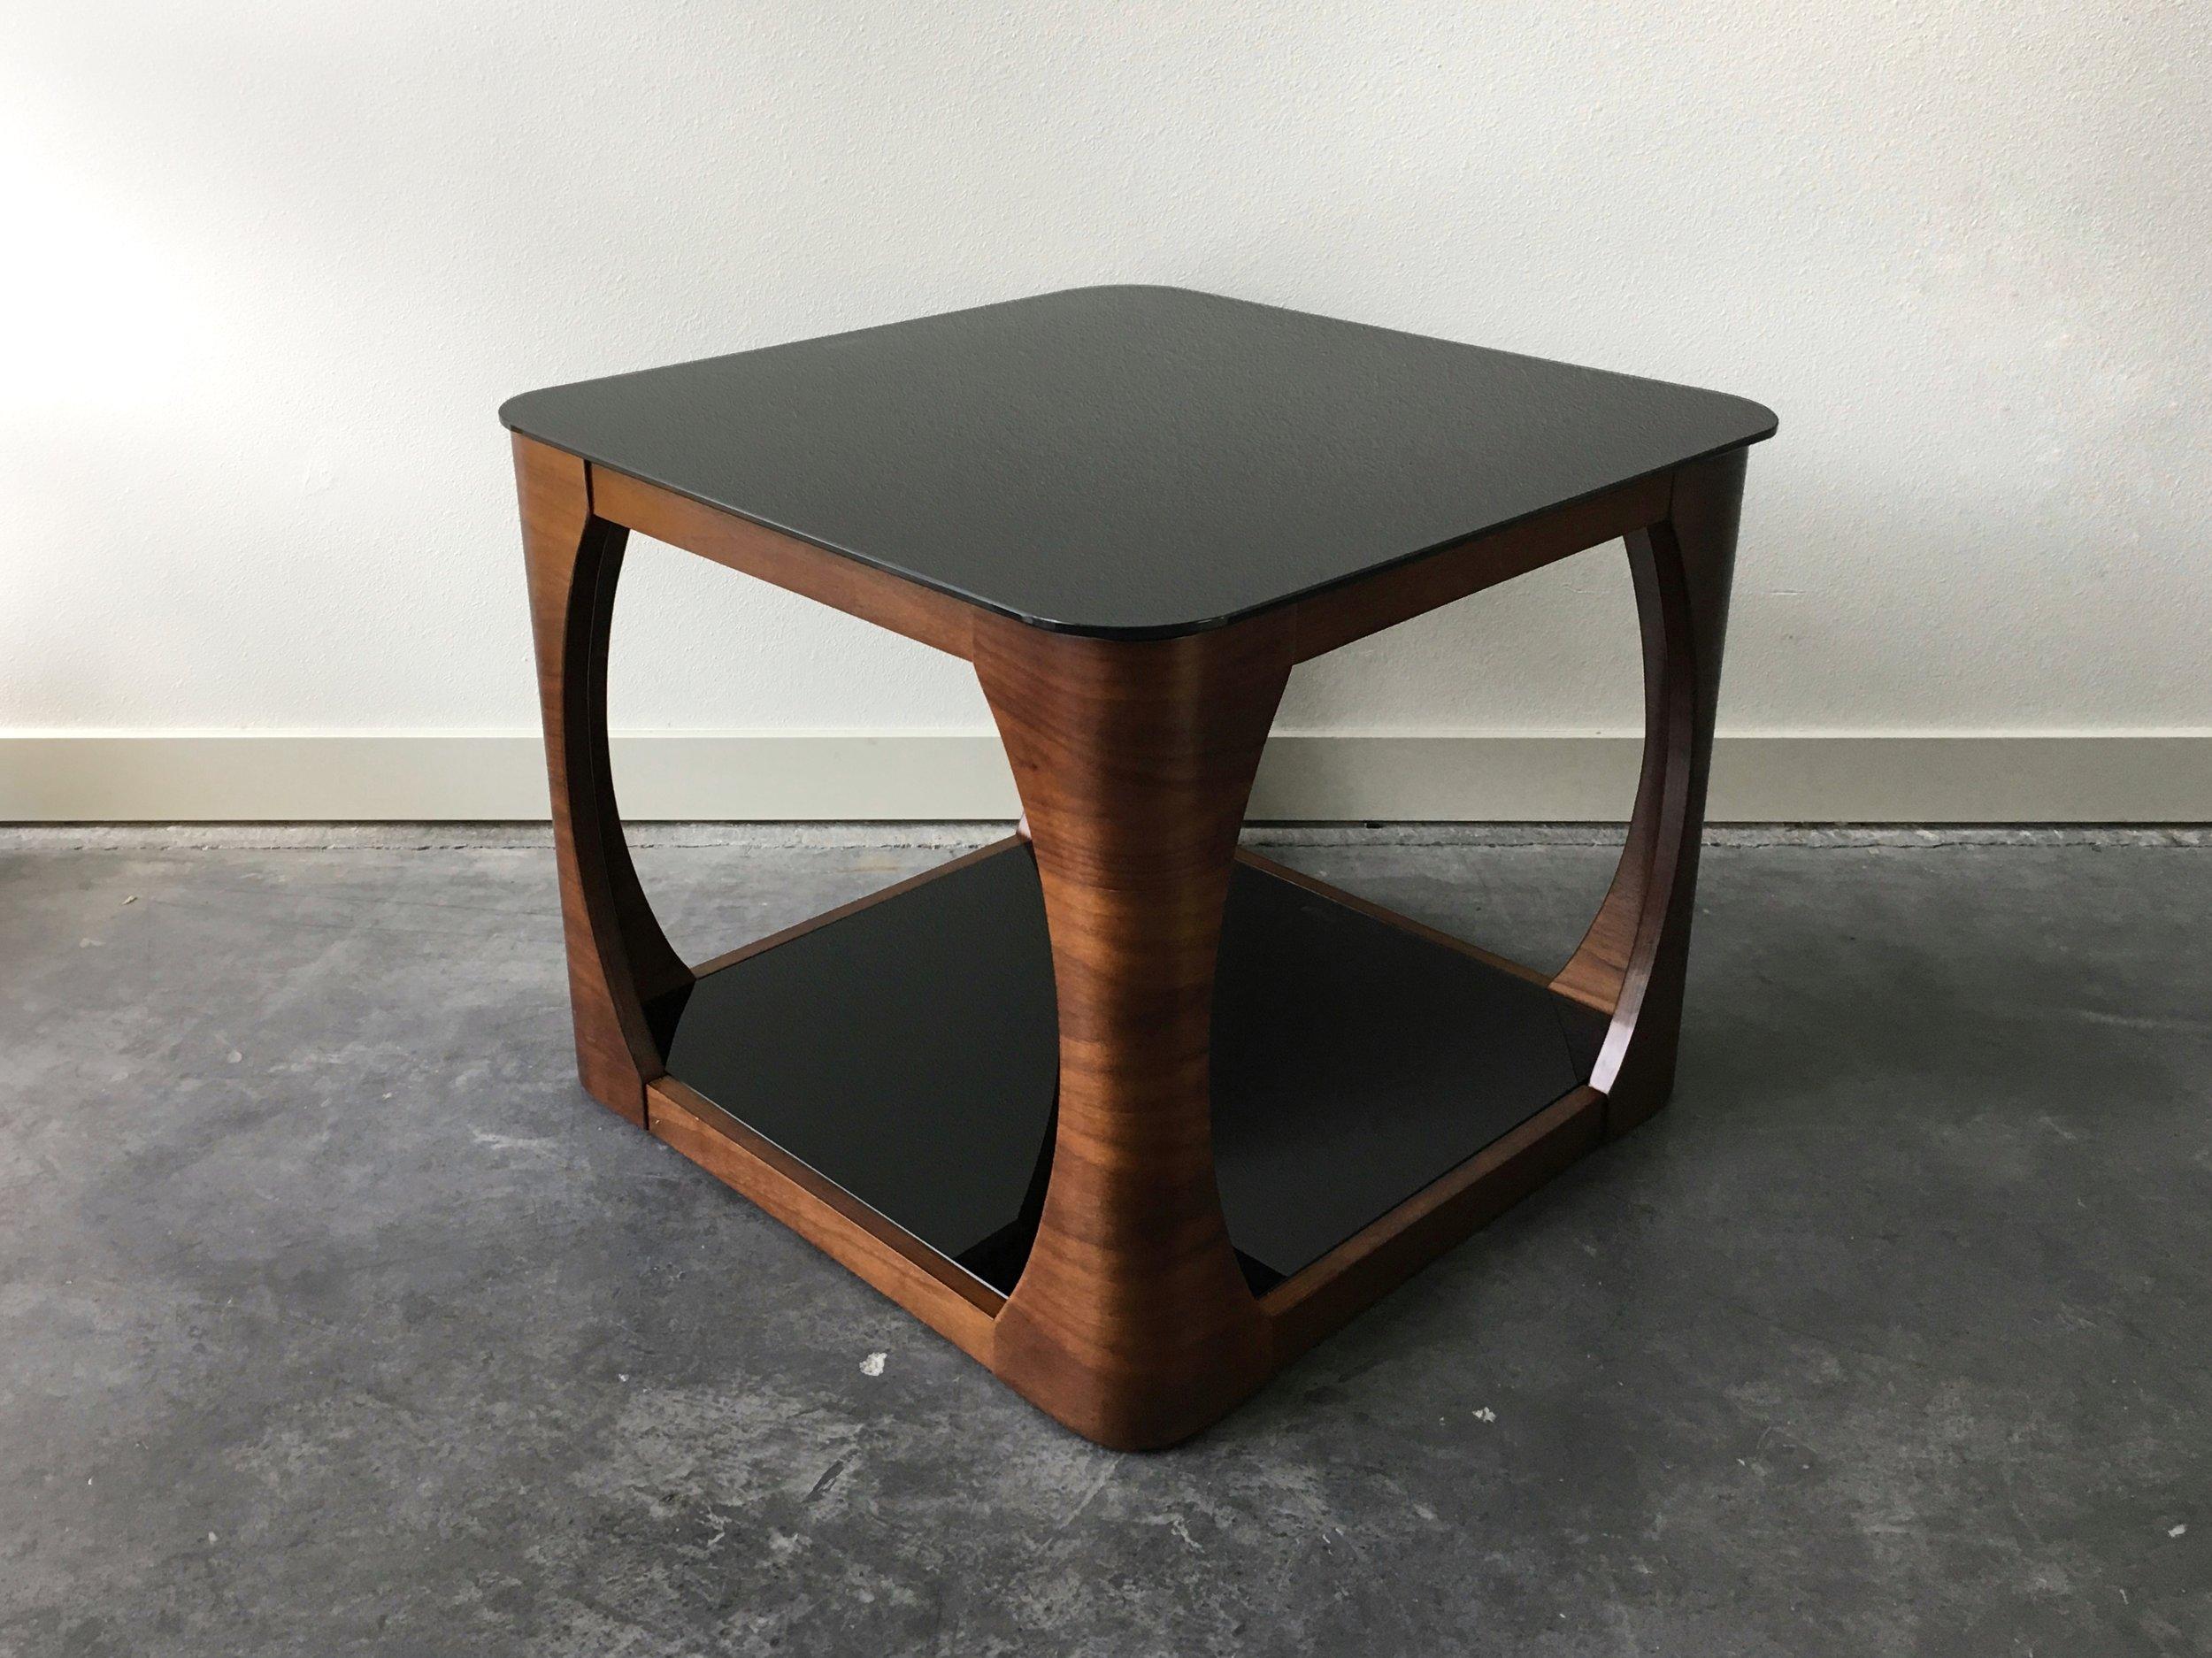 modern wood furniture. Vintage Mid Century Modern Wood + Glass Square Table. Furniture .